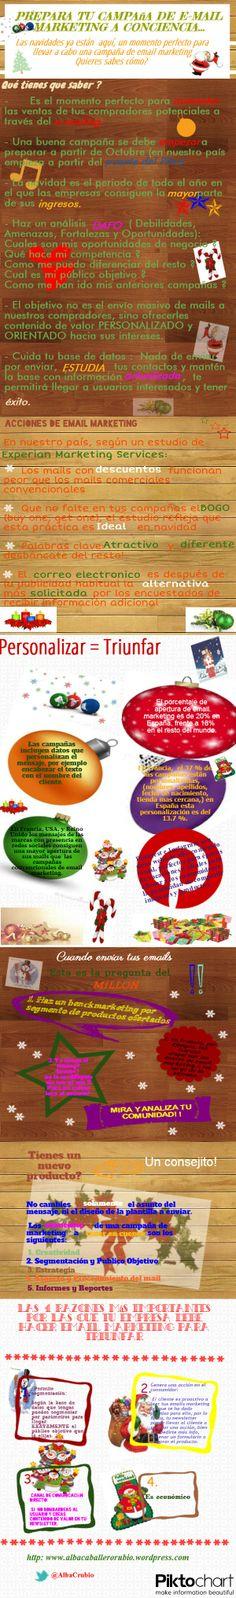 Infografia - Email Marketing en Navidad